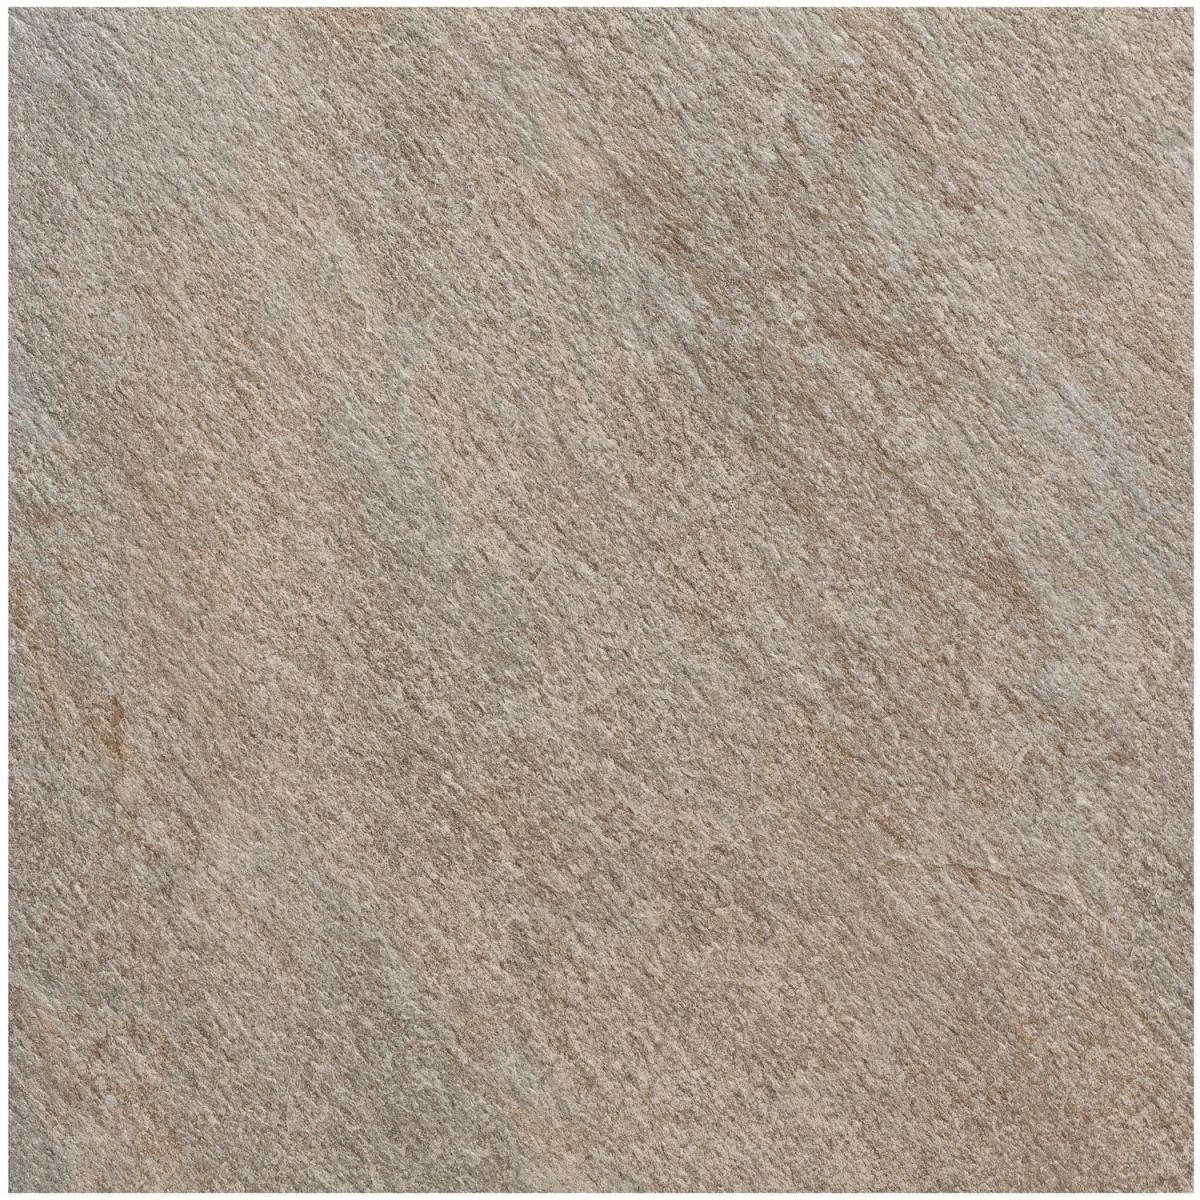 Feinsteinzeug-Platte grau, 60x60x2 cm